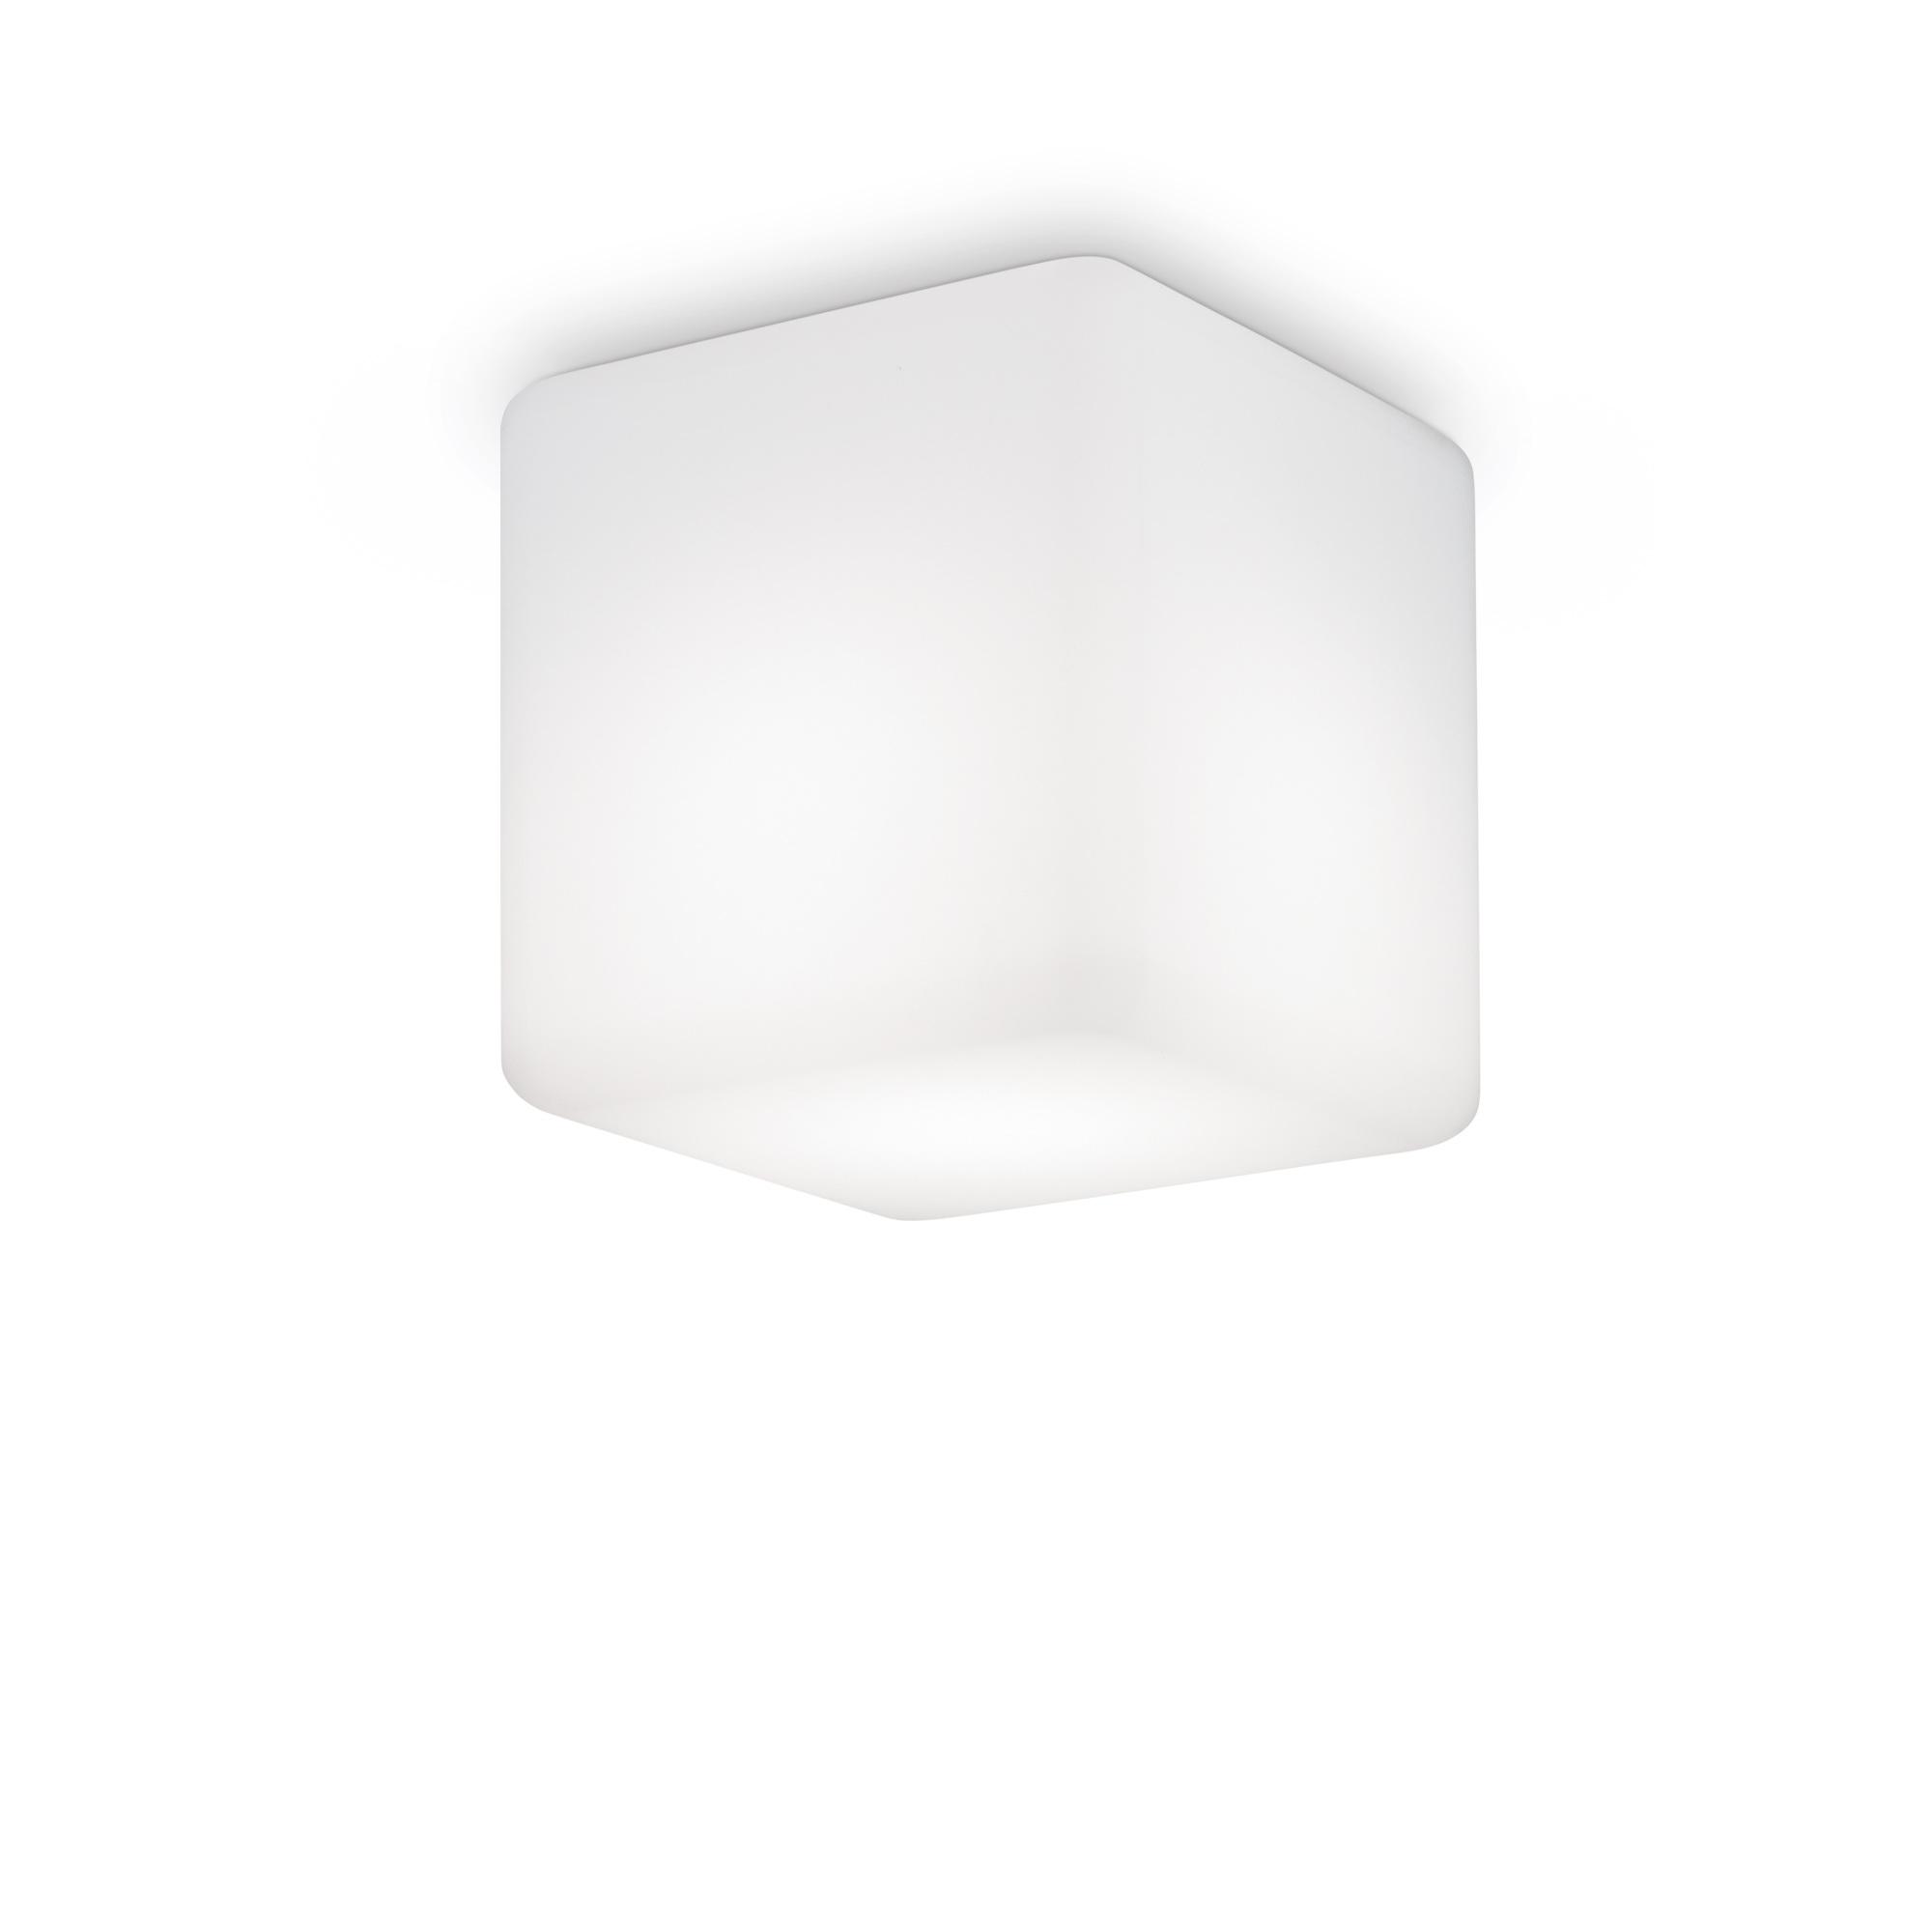 LUNA PL1 MEDIUM уличный потолочный светильник белый